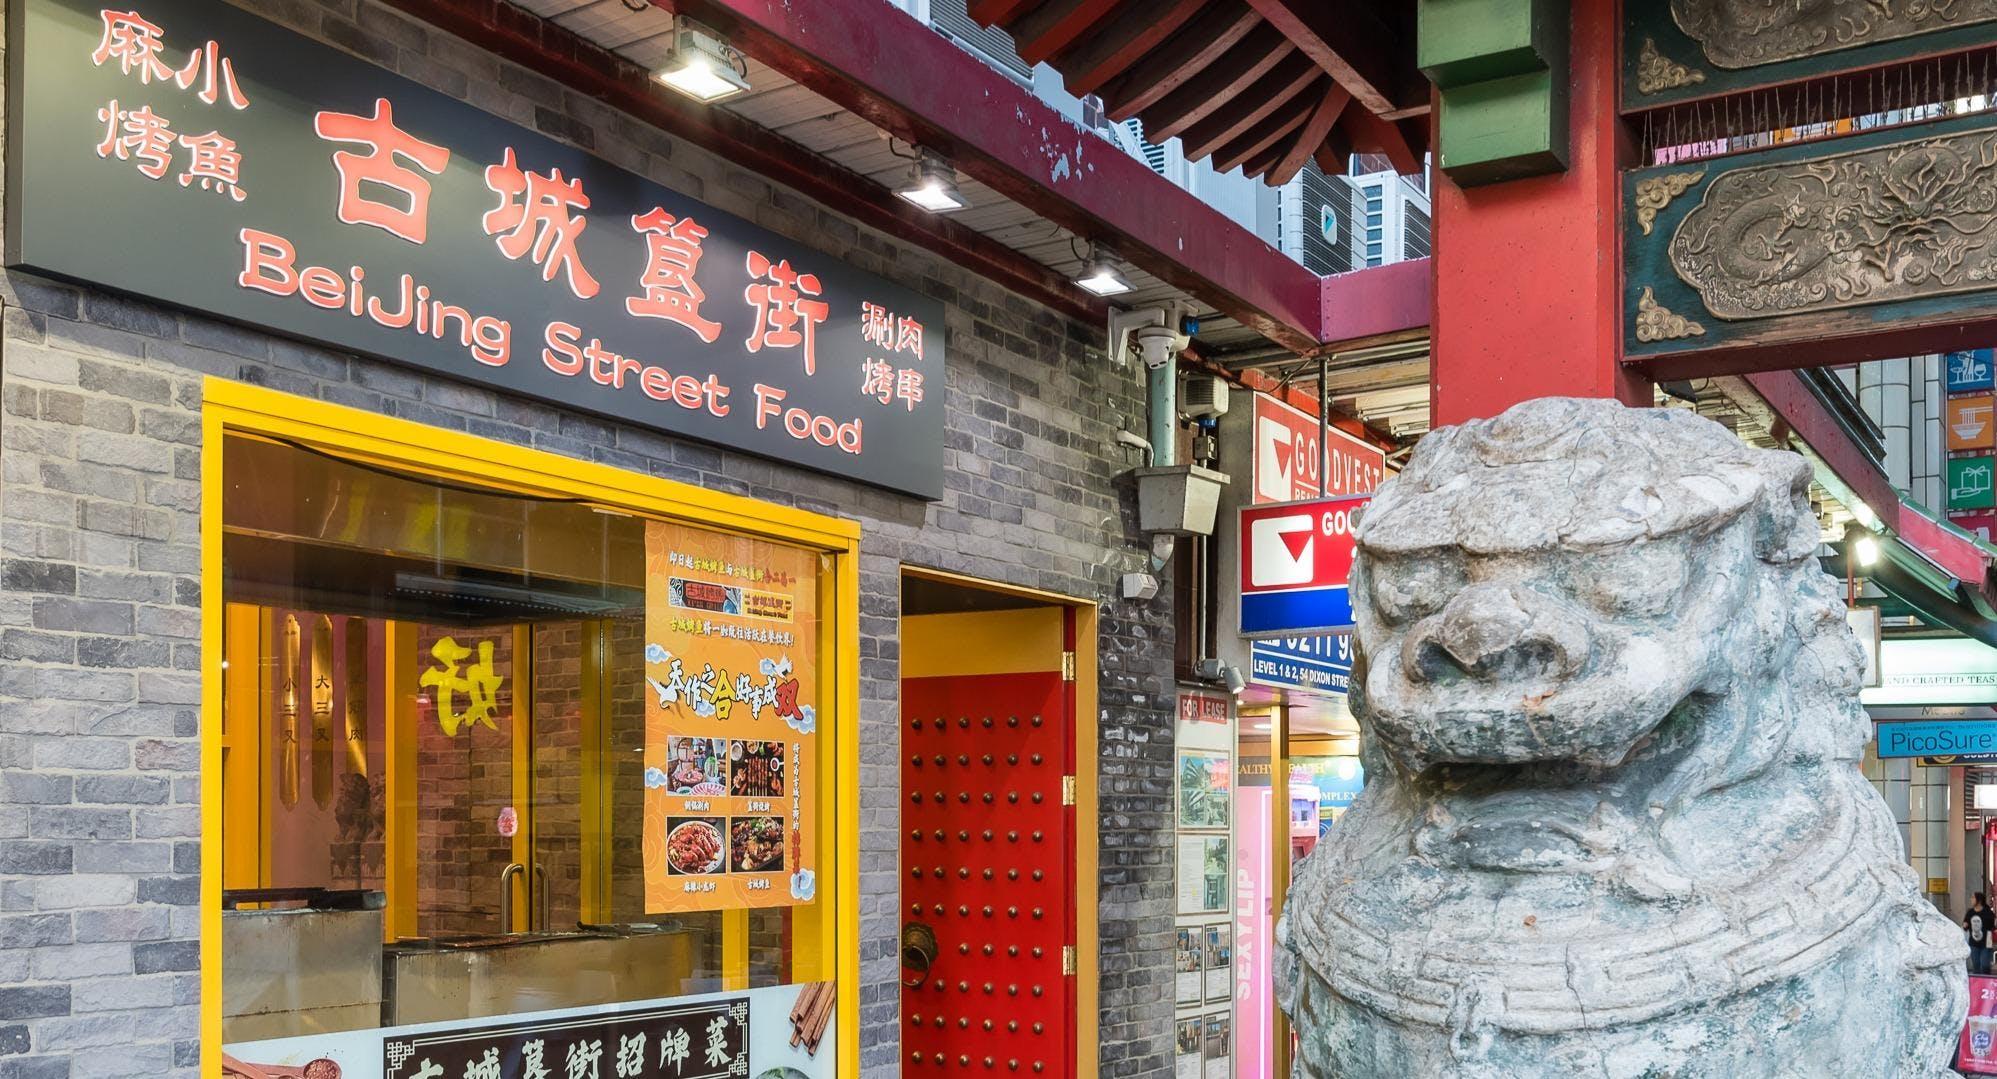 Beijing Street Food Grill Fish 古城簋街 烤鱼 Sydney image 1